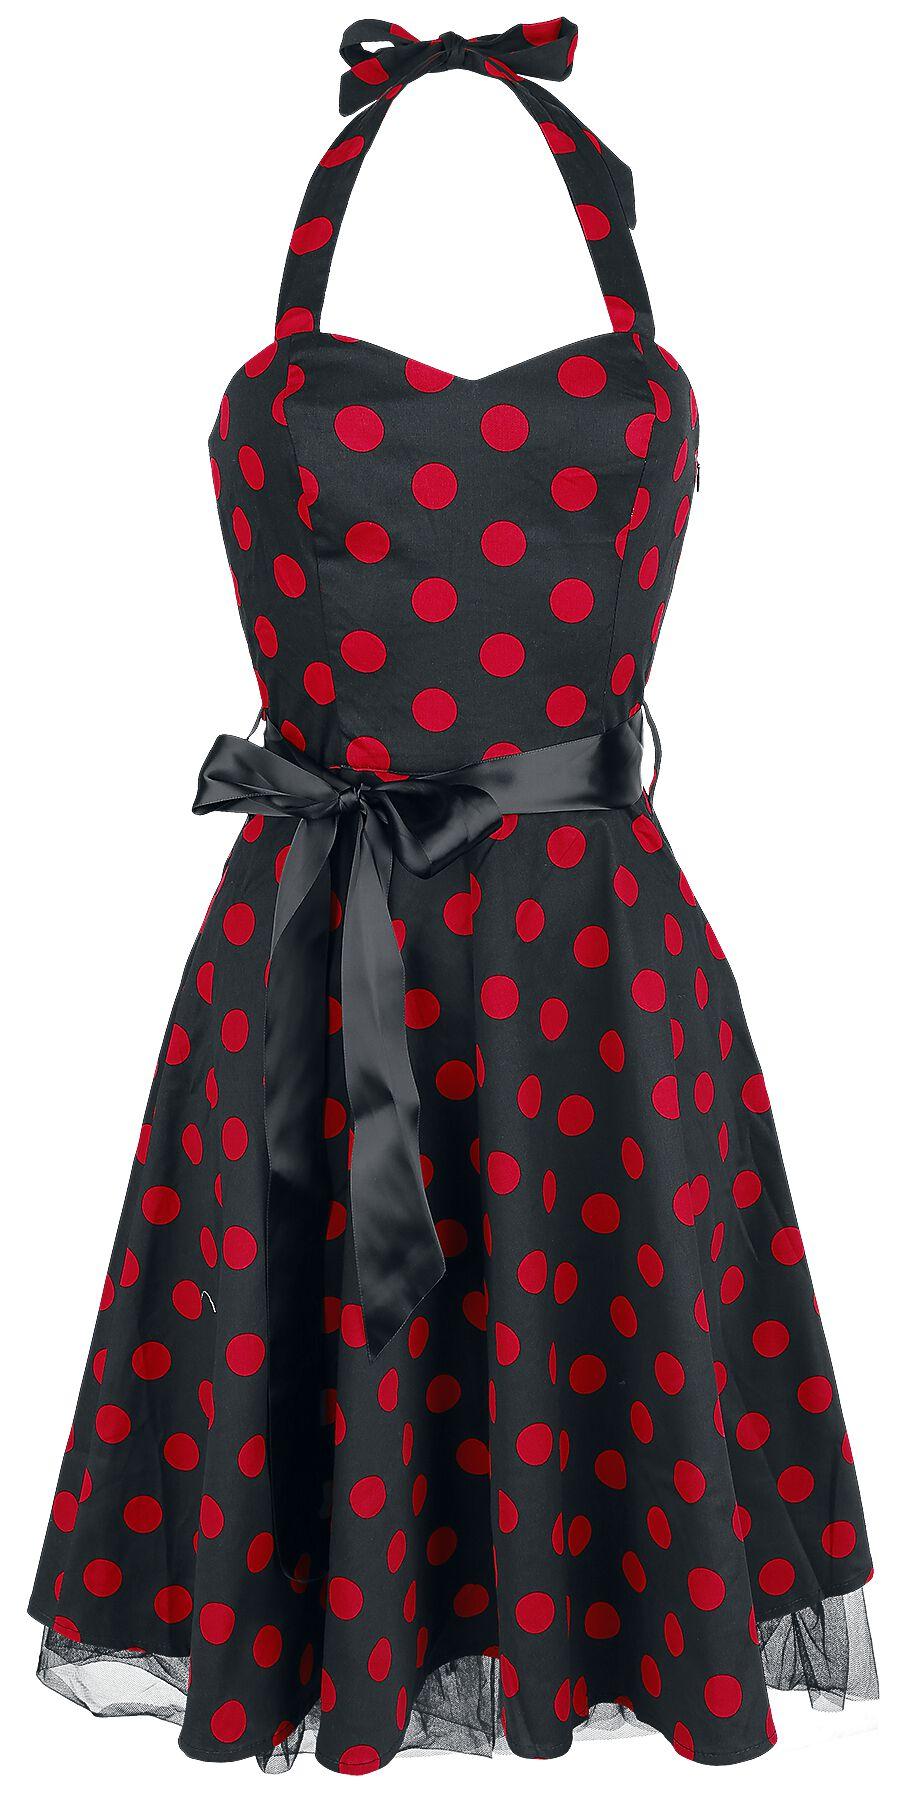 H&R London Polka Dot Dress Kleid schwarz/rot